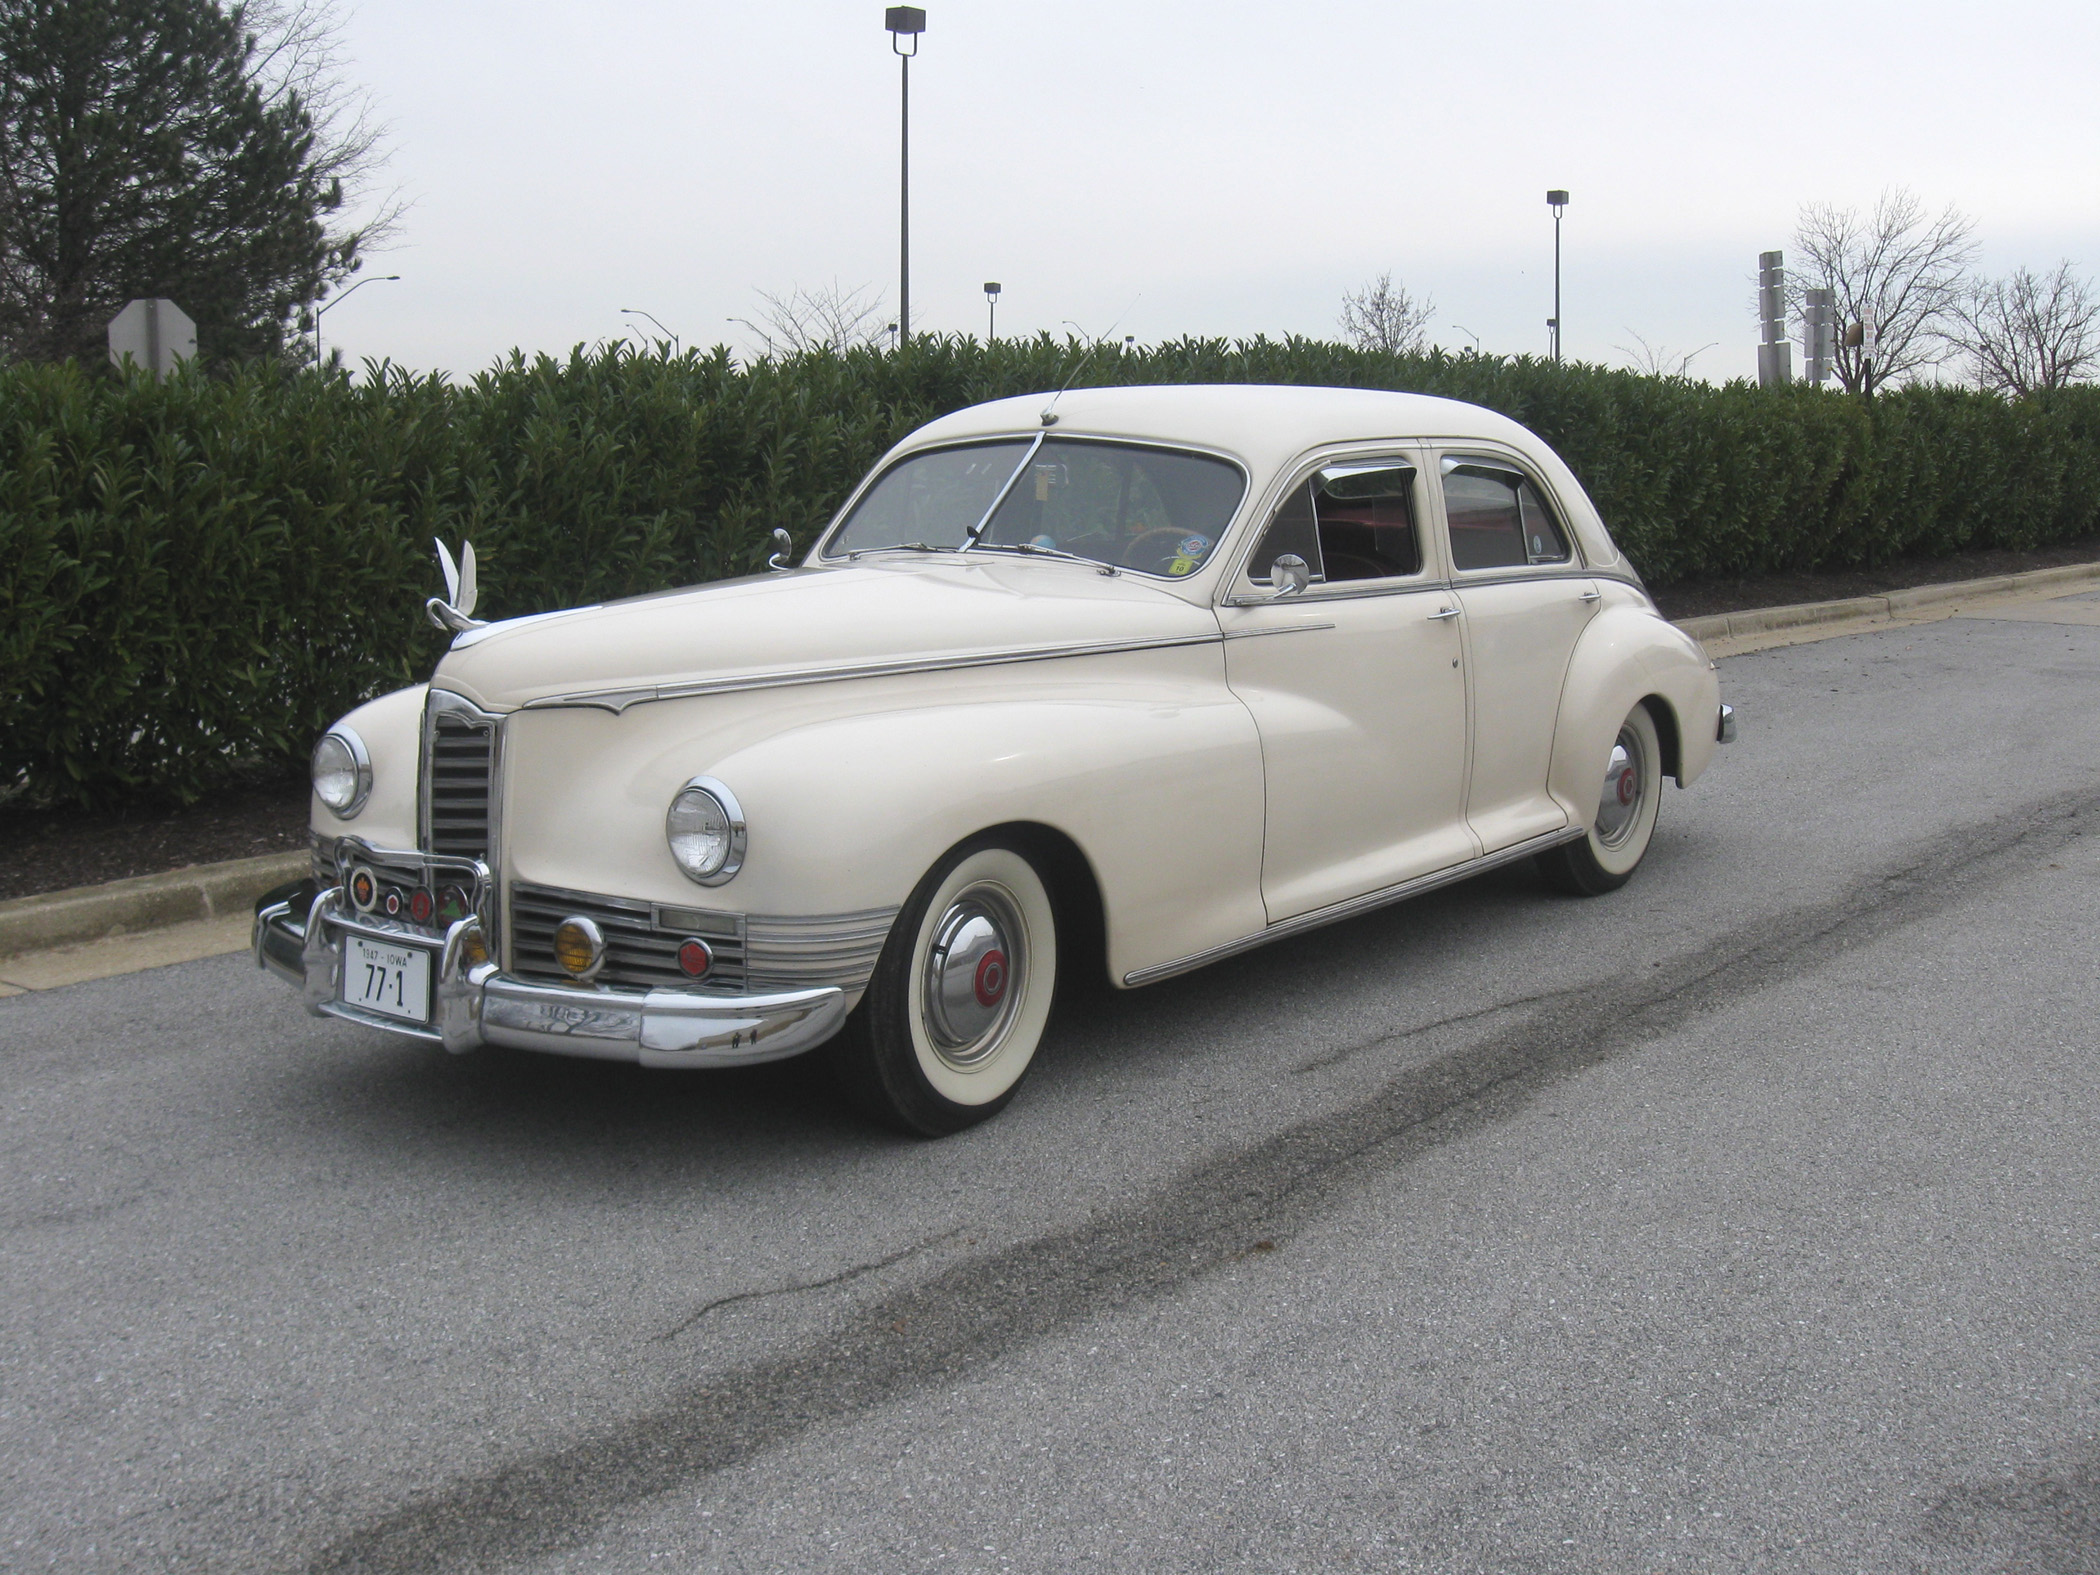 1948 Desoto Wiring Diagram Ask Answer 1955 1949 Dodge Odicis